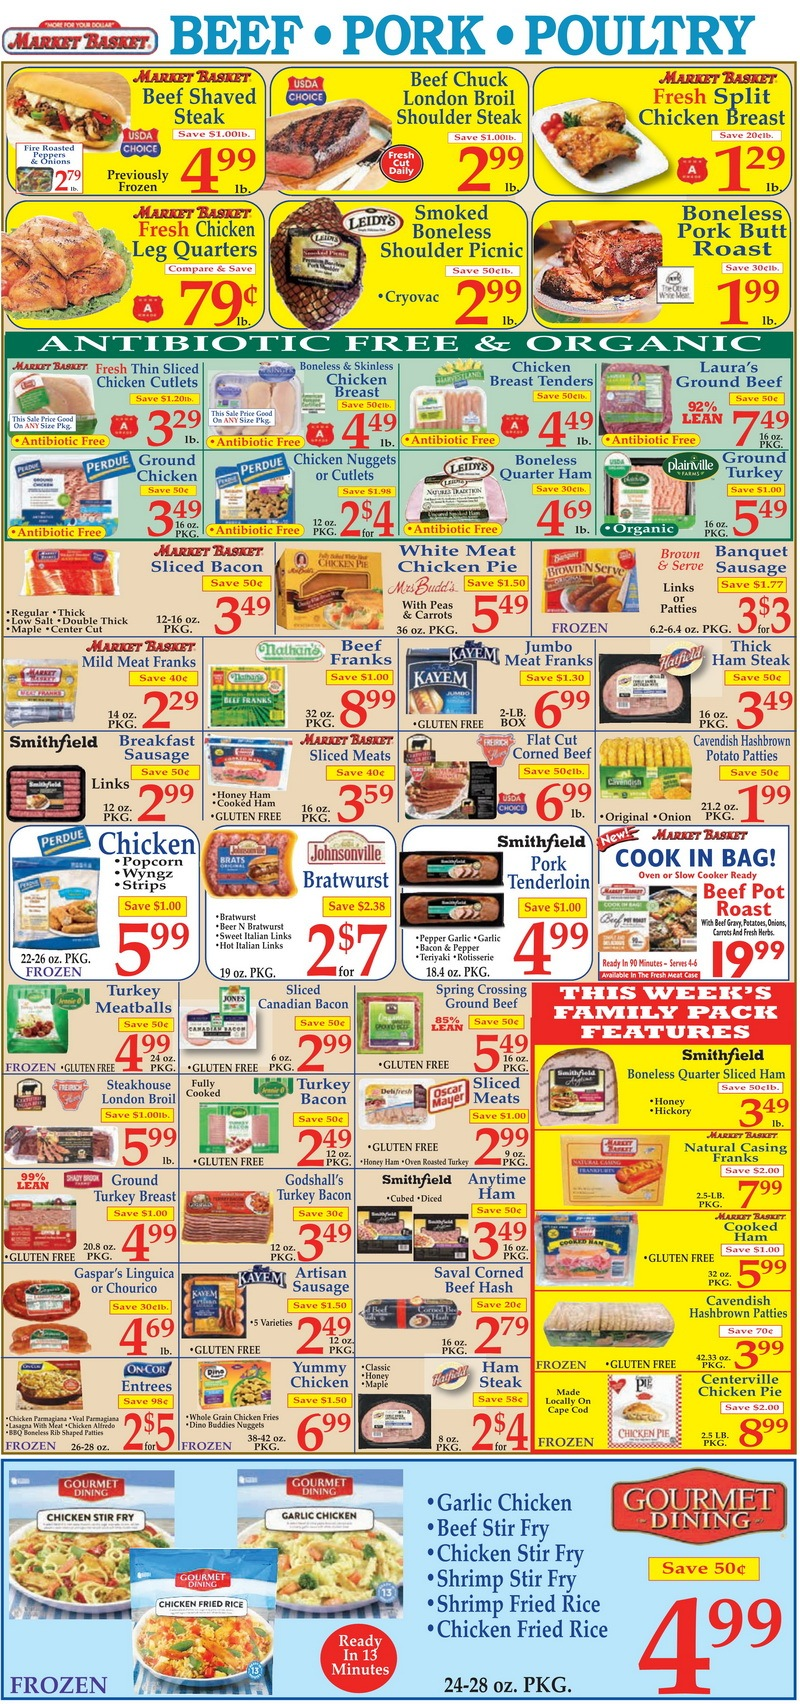 Zion Market Weekly Sale